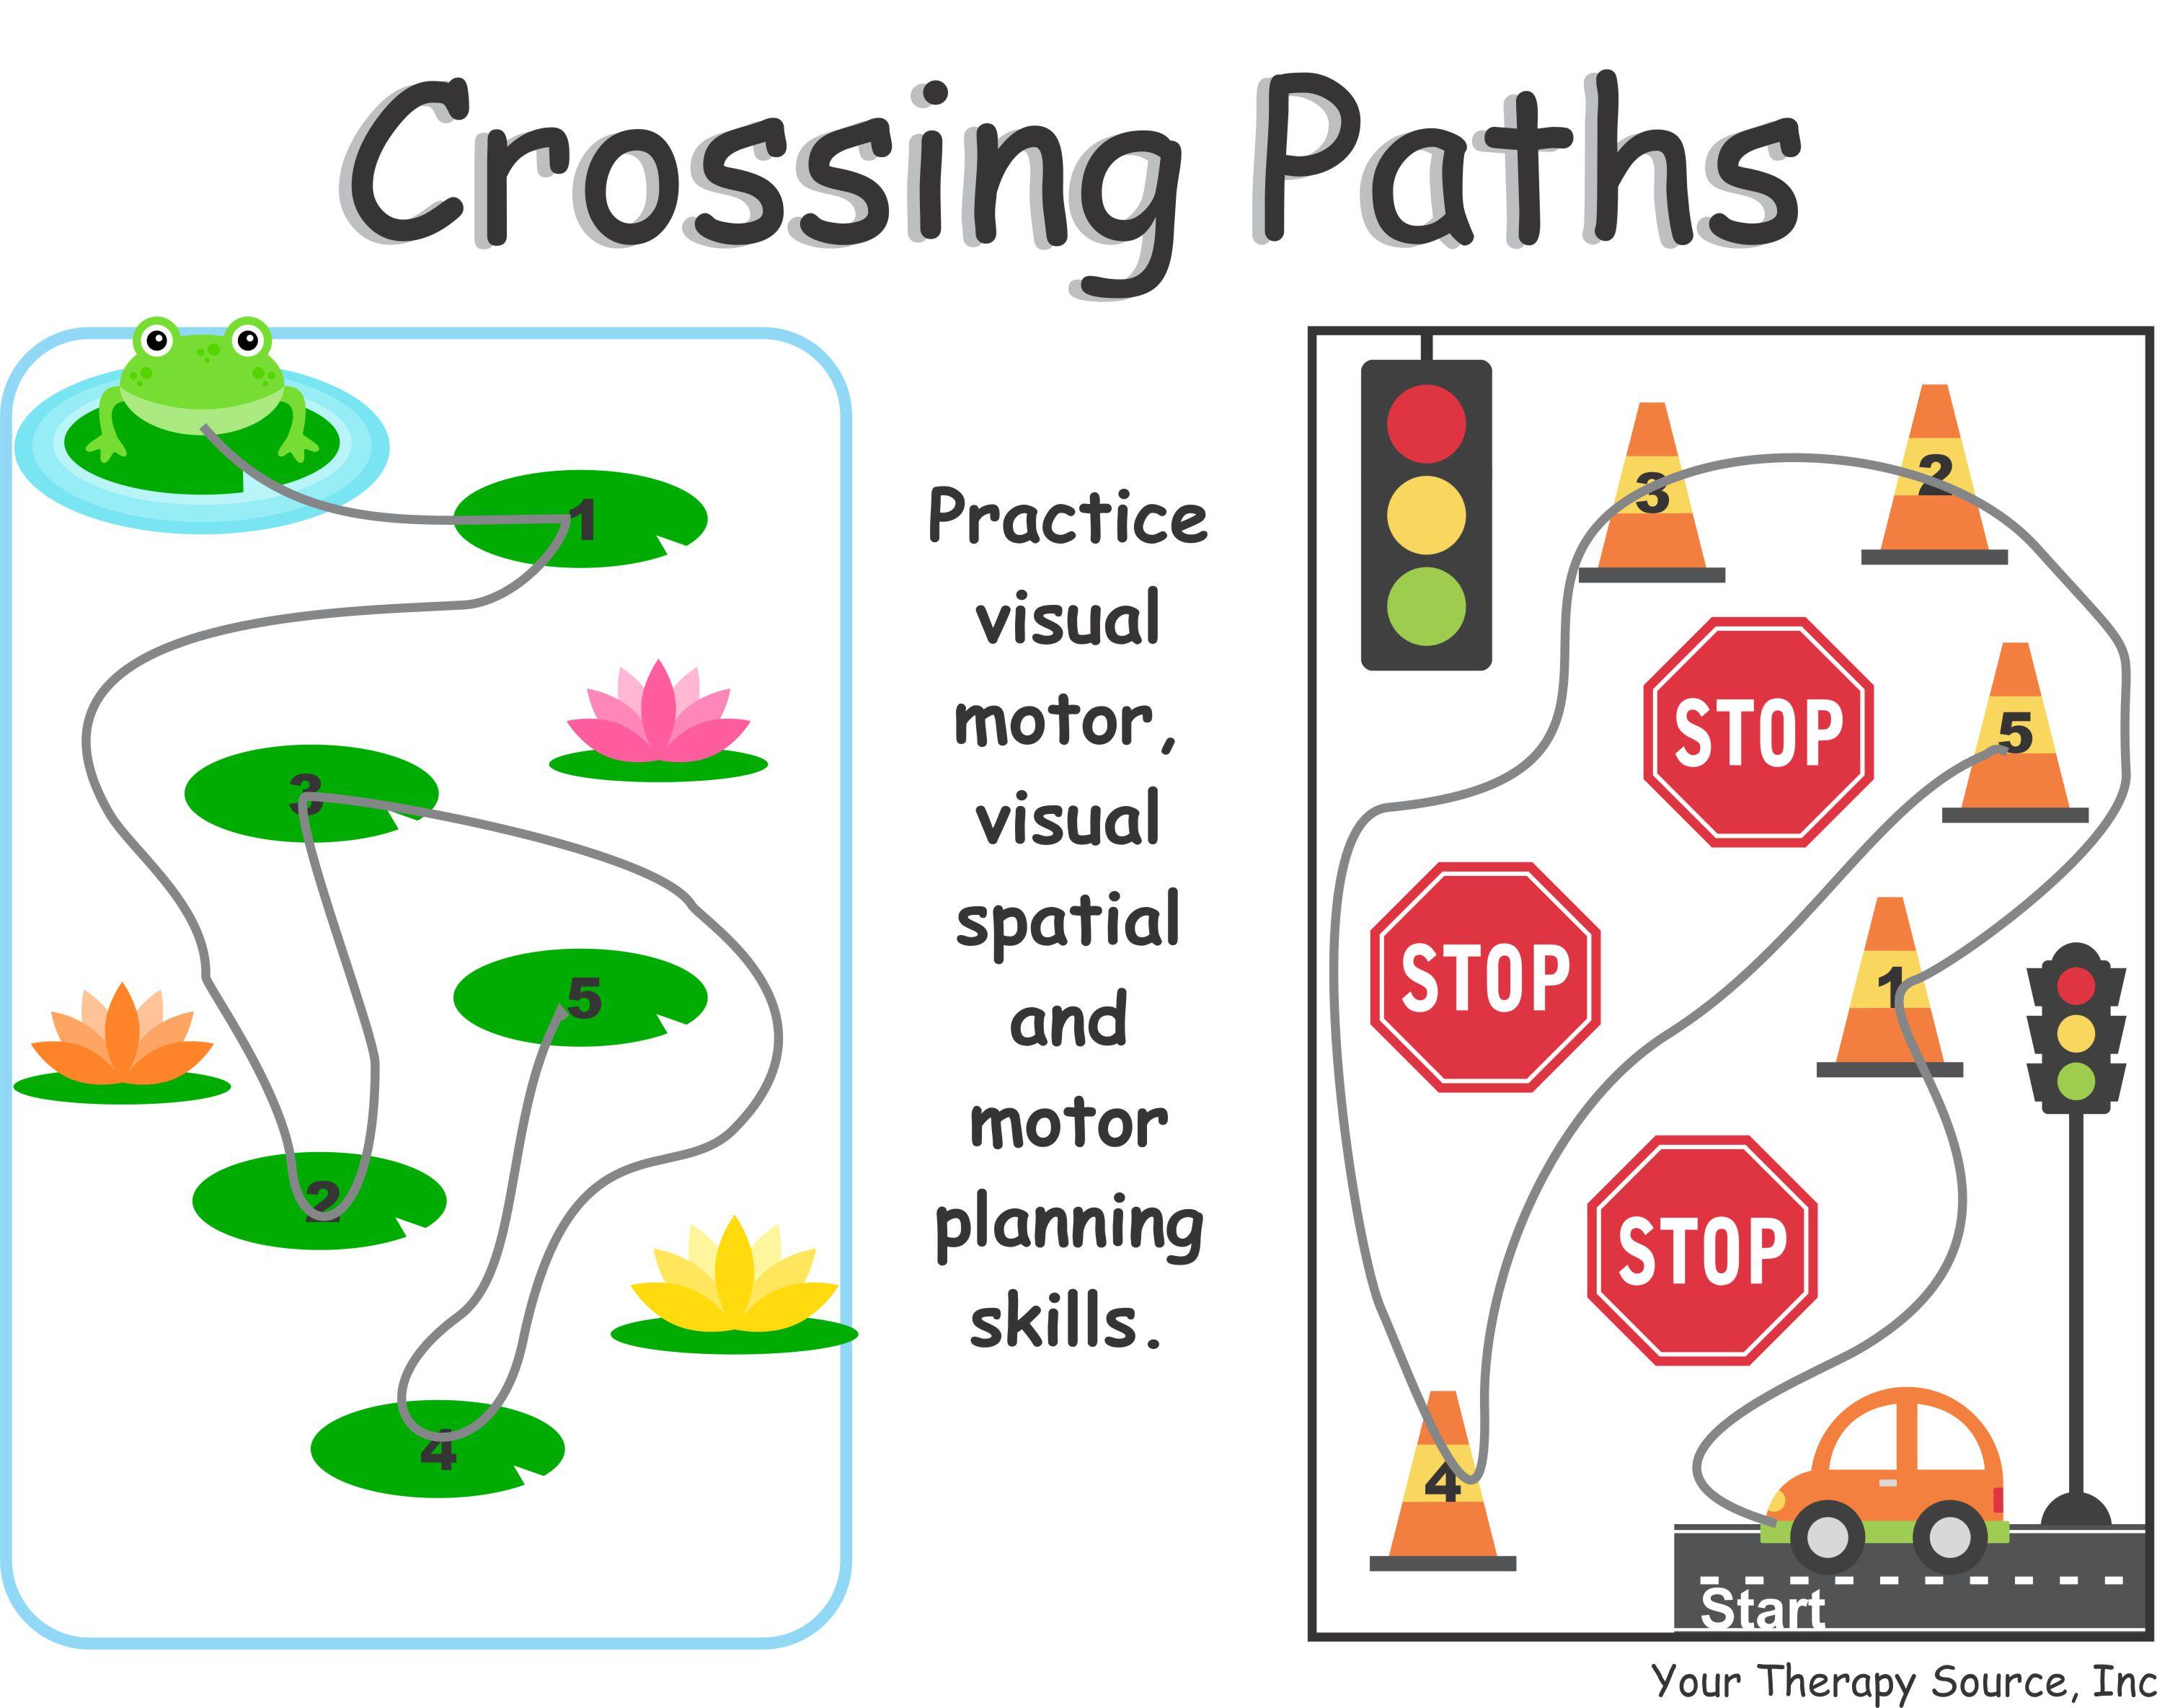 Crossing Paths